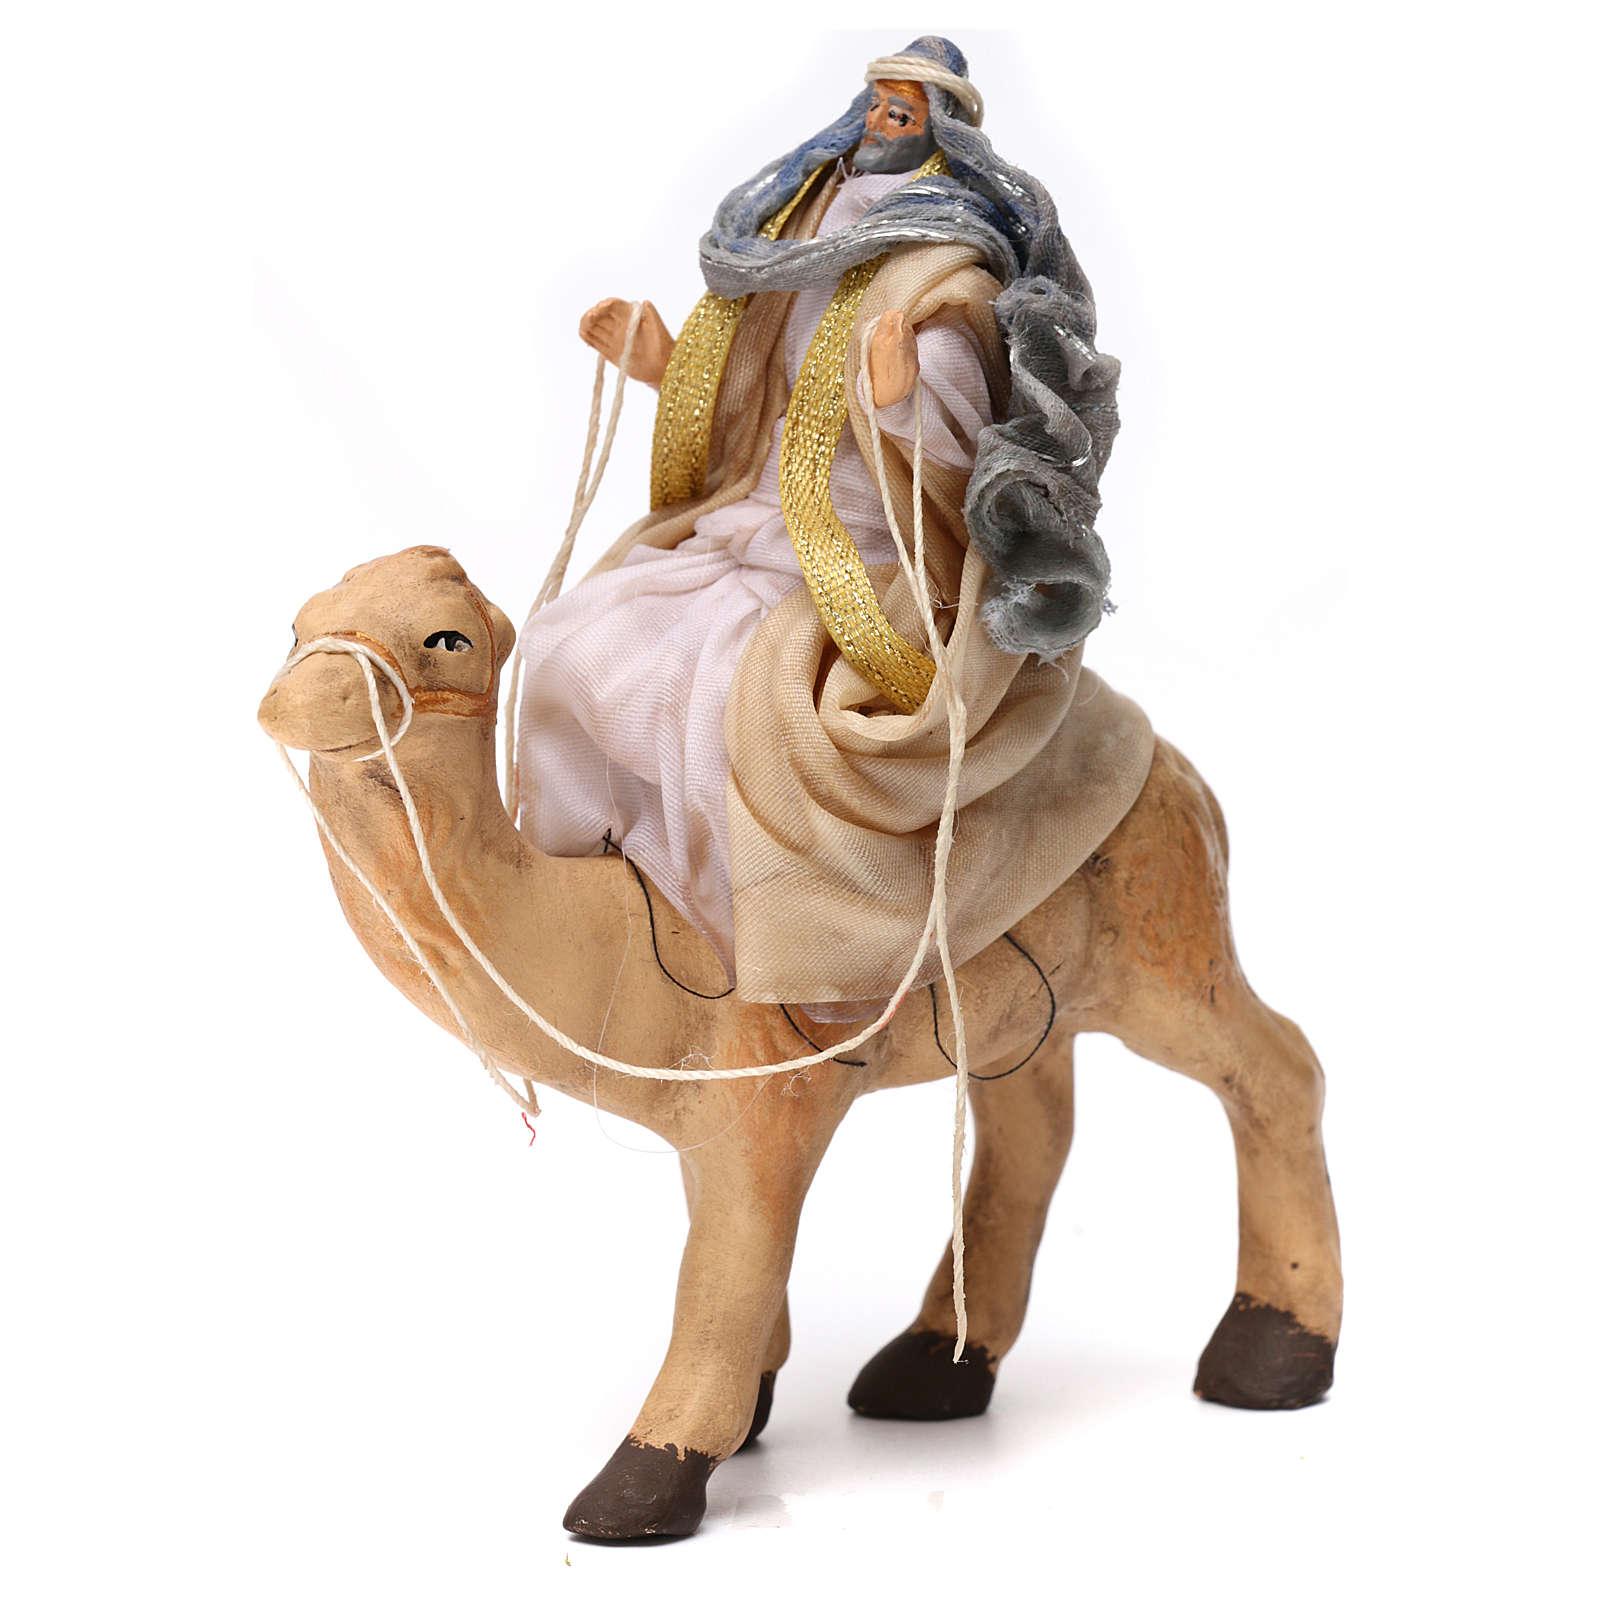 White Magi King sitting on a camel for Naples nativity 6 cm 4